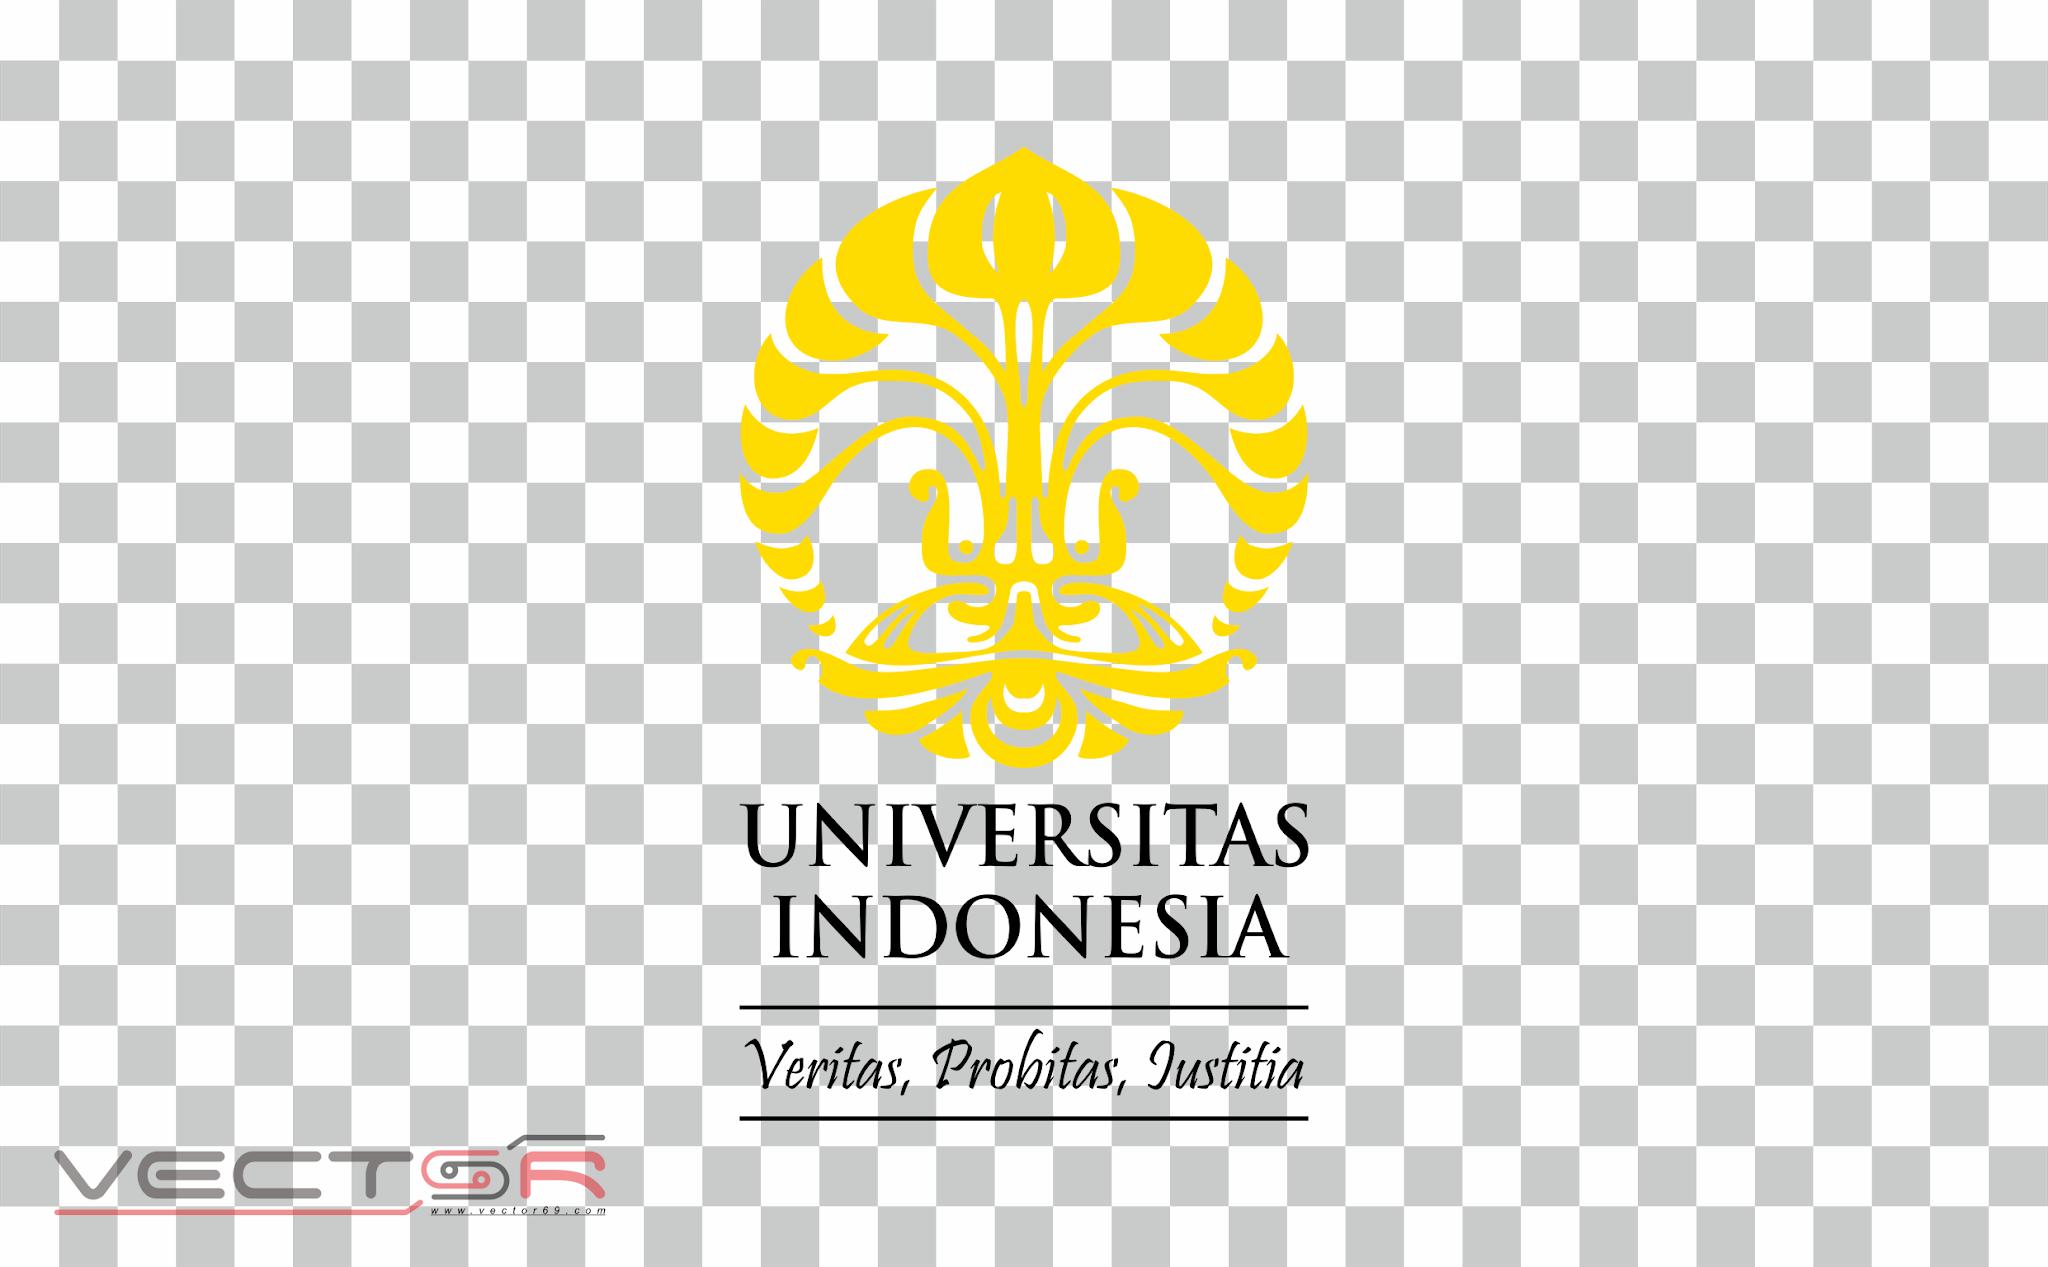 Logo UI (Universitas Indonesia) - Download .PNG (Portable Network Graphics) Transparent Images